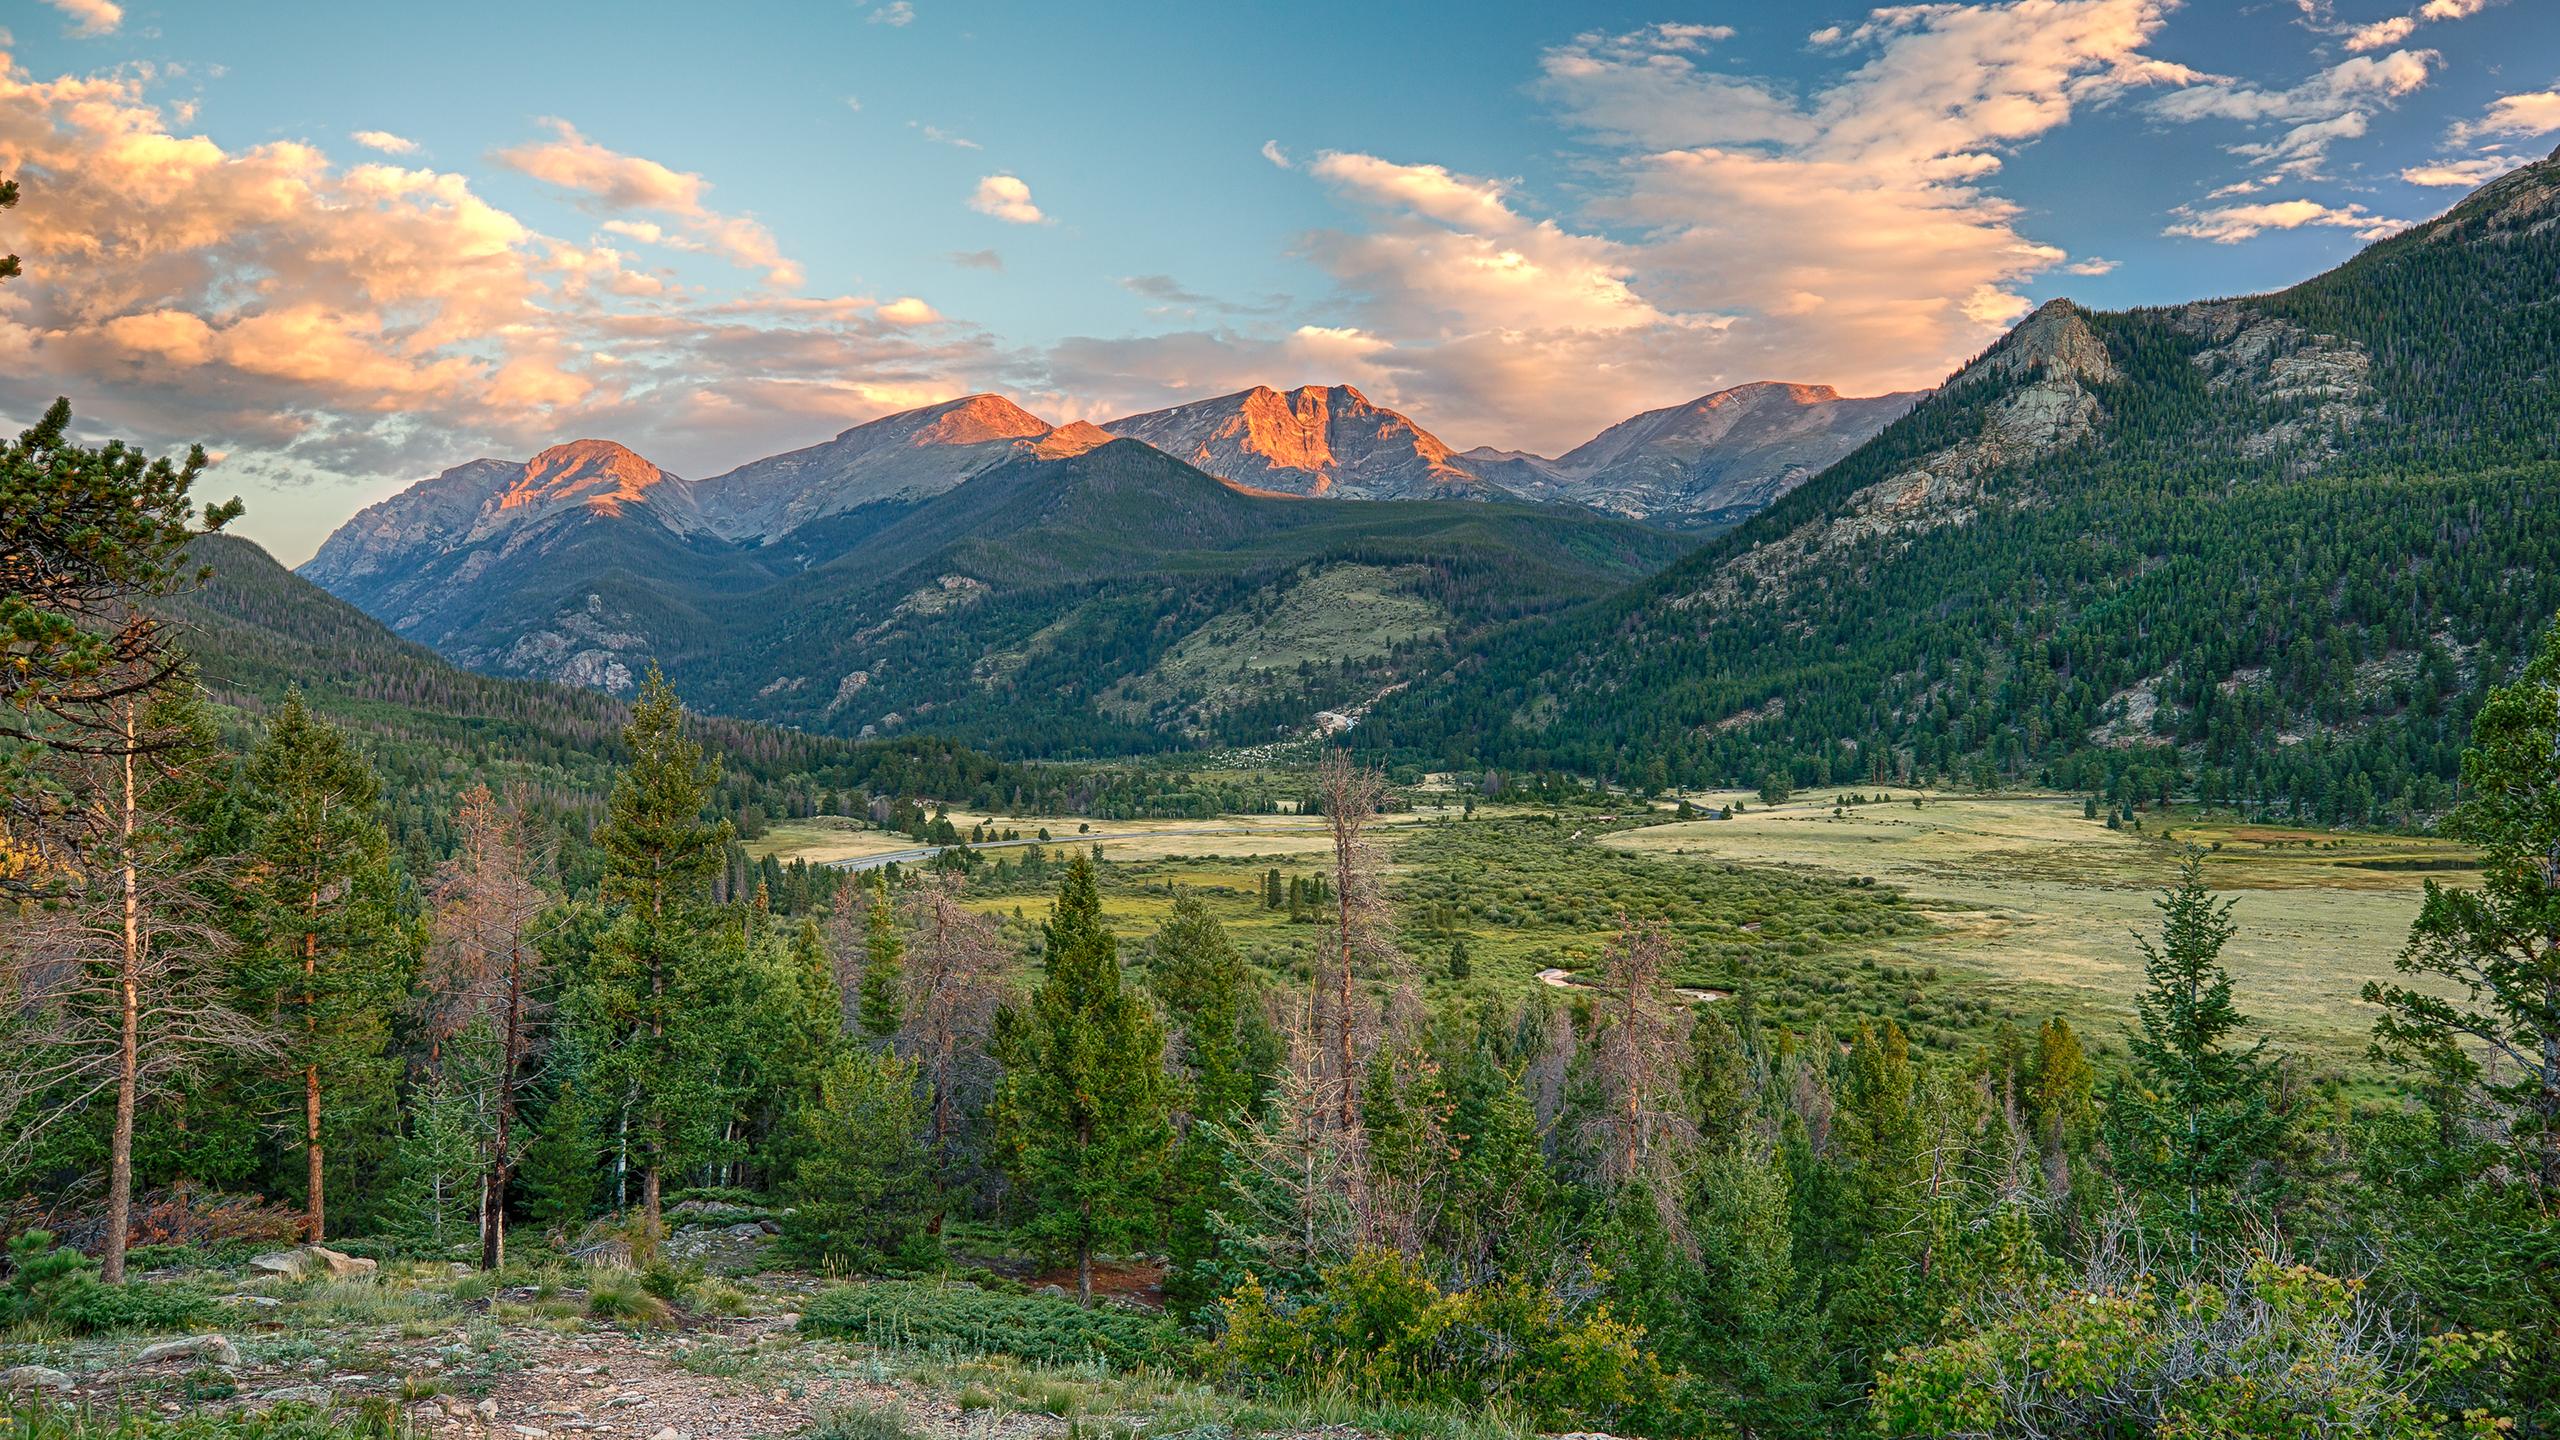 rocky_mountain_sunrise_wallpaper_2560x1440